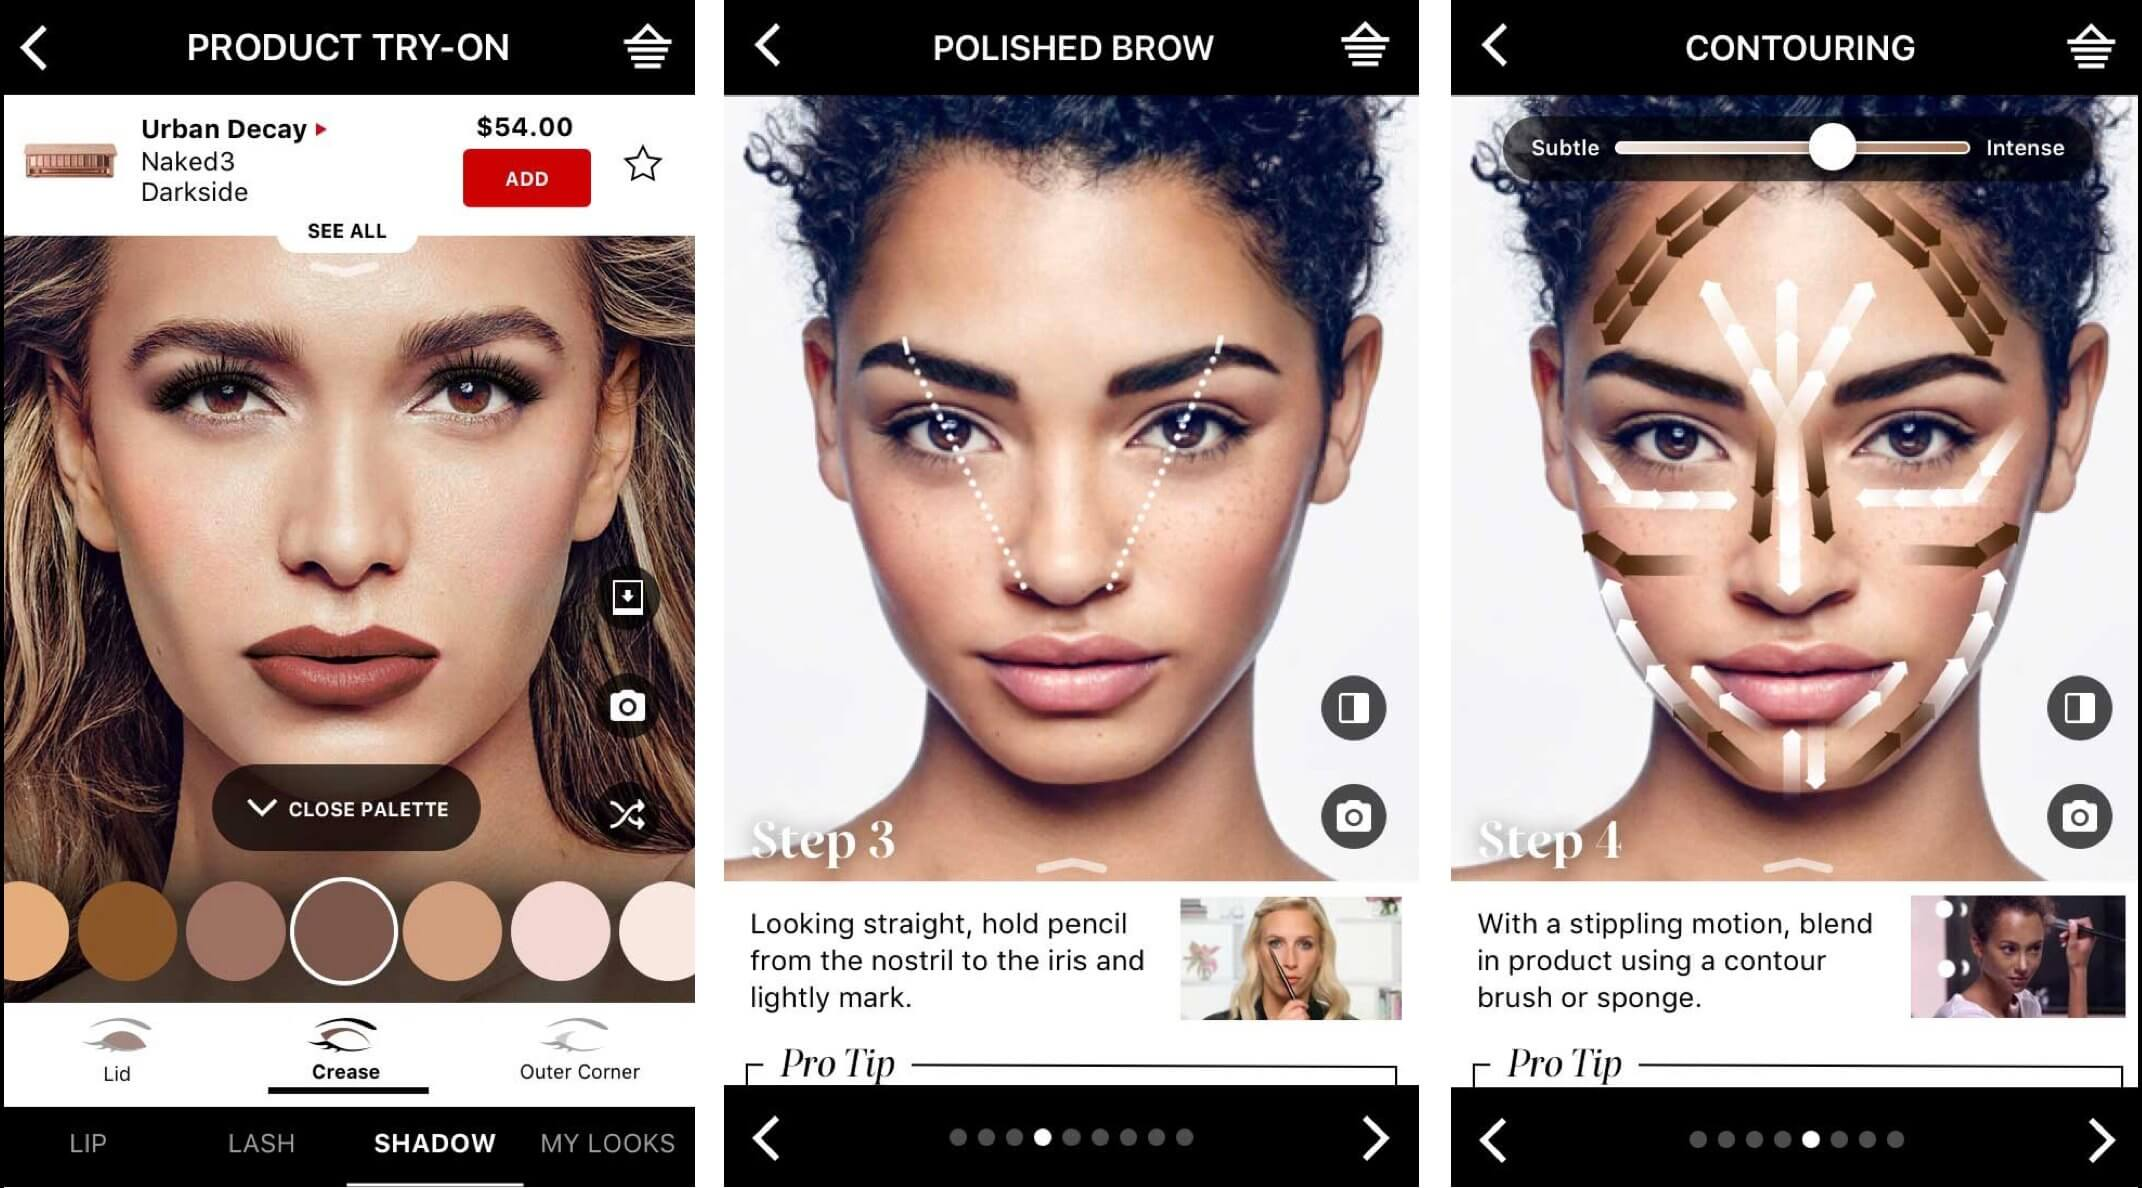 Sephora's Virtual Artist app